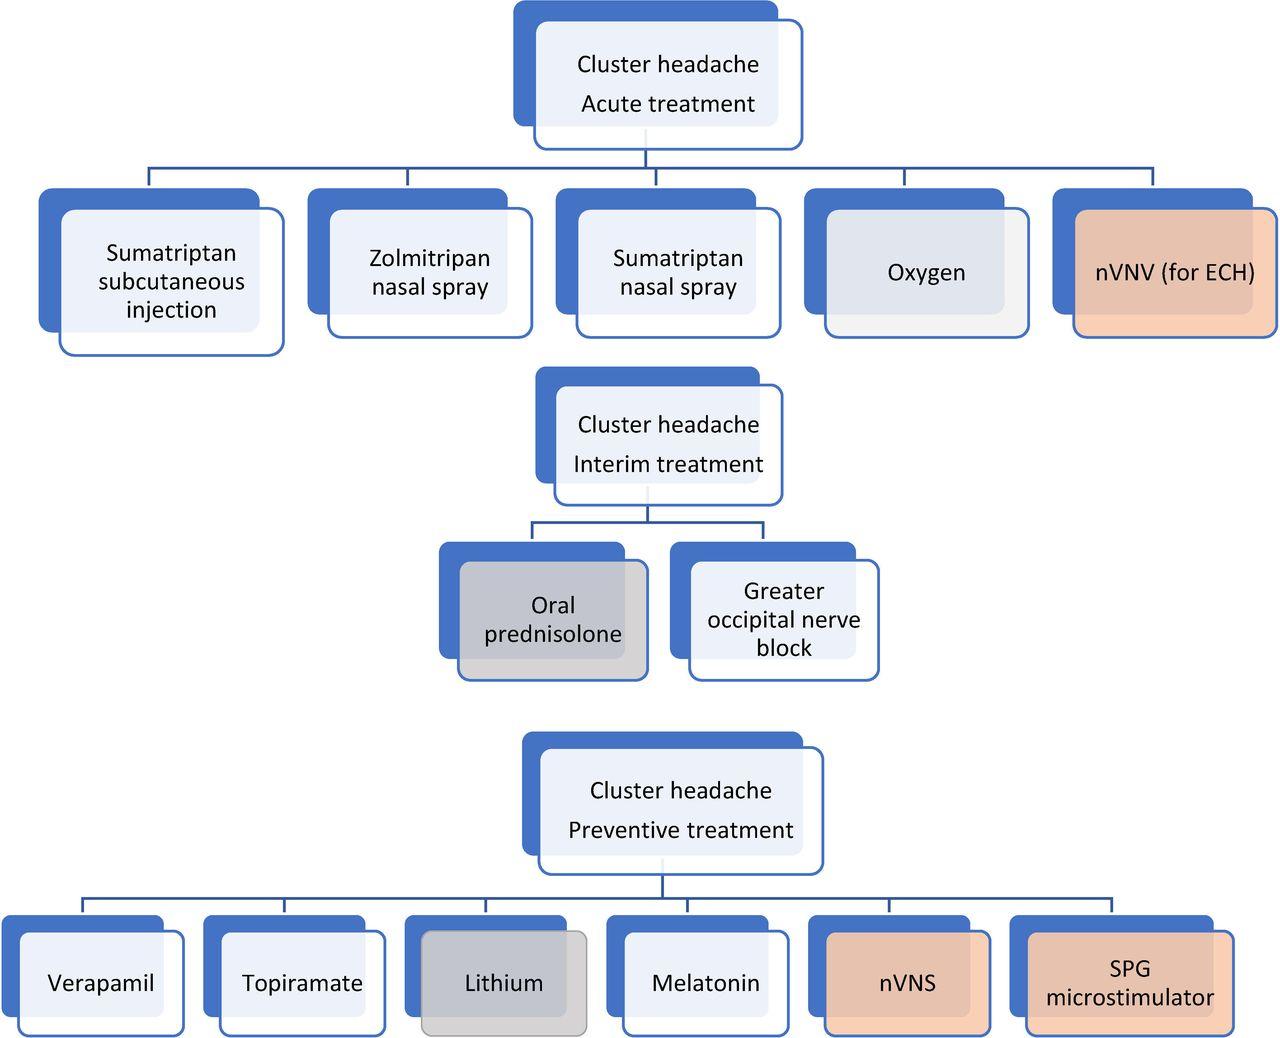 Managing cluster headache | Practical Neurology